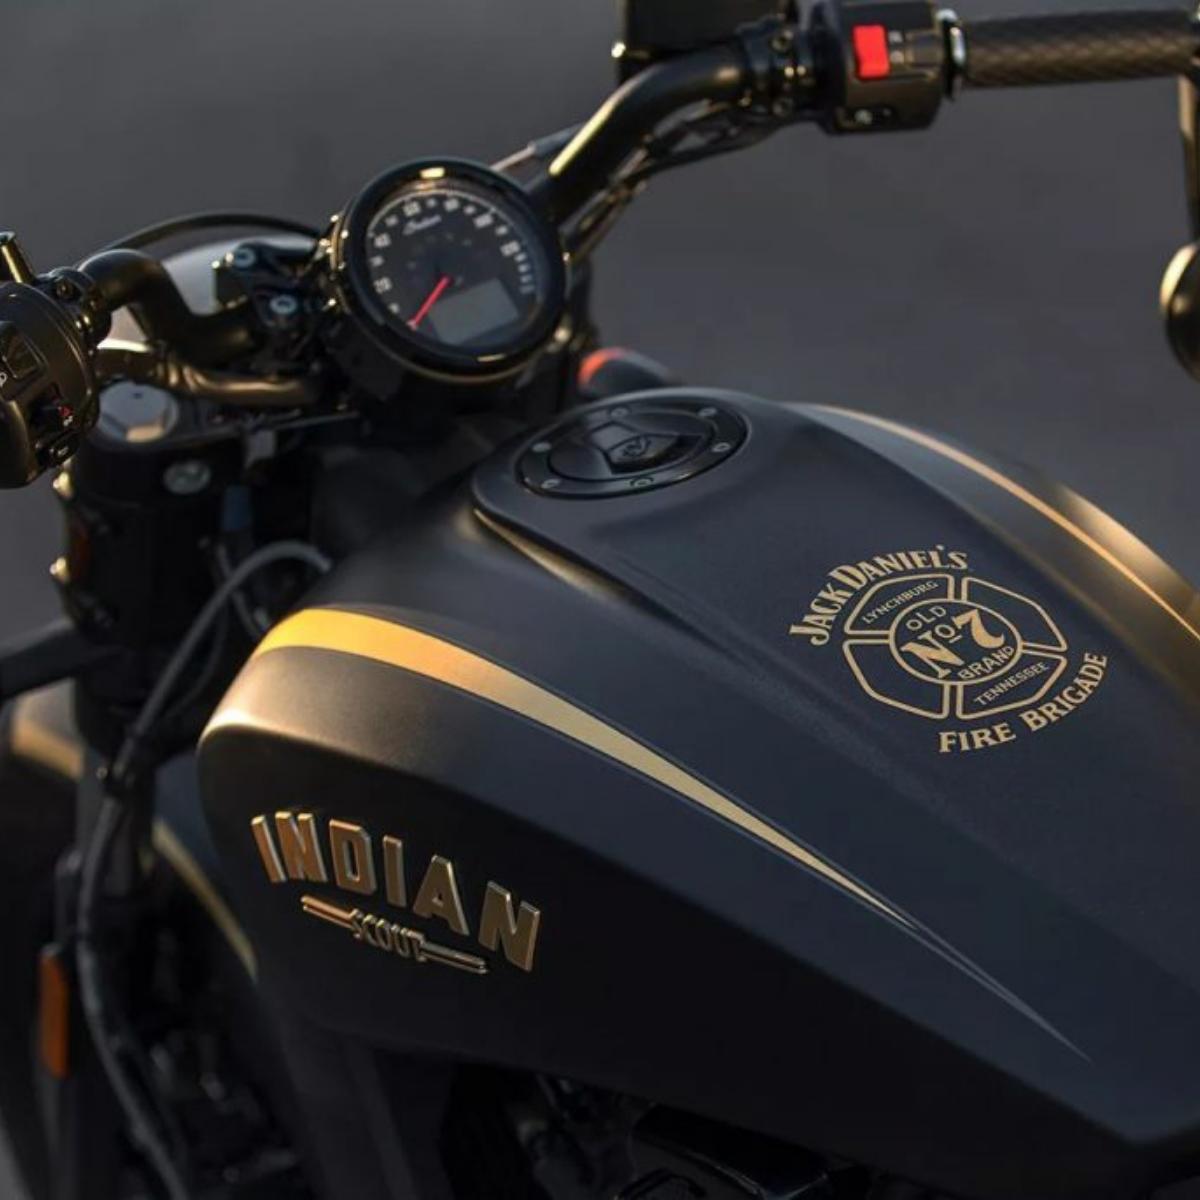 Indian Scout Bobber Jack Daniels Edition Indian Motorcycle Indian Scout Motorcycle [ 1200 x 1200 Pixel ]